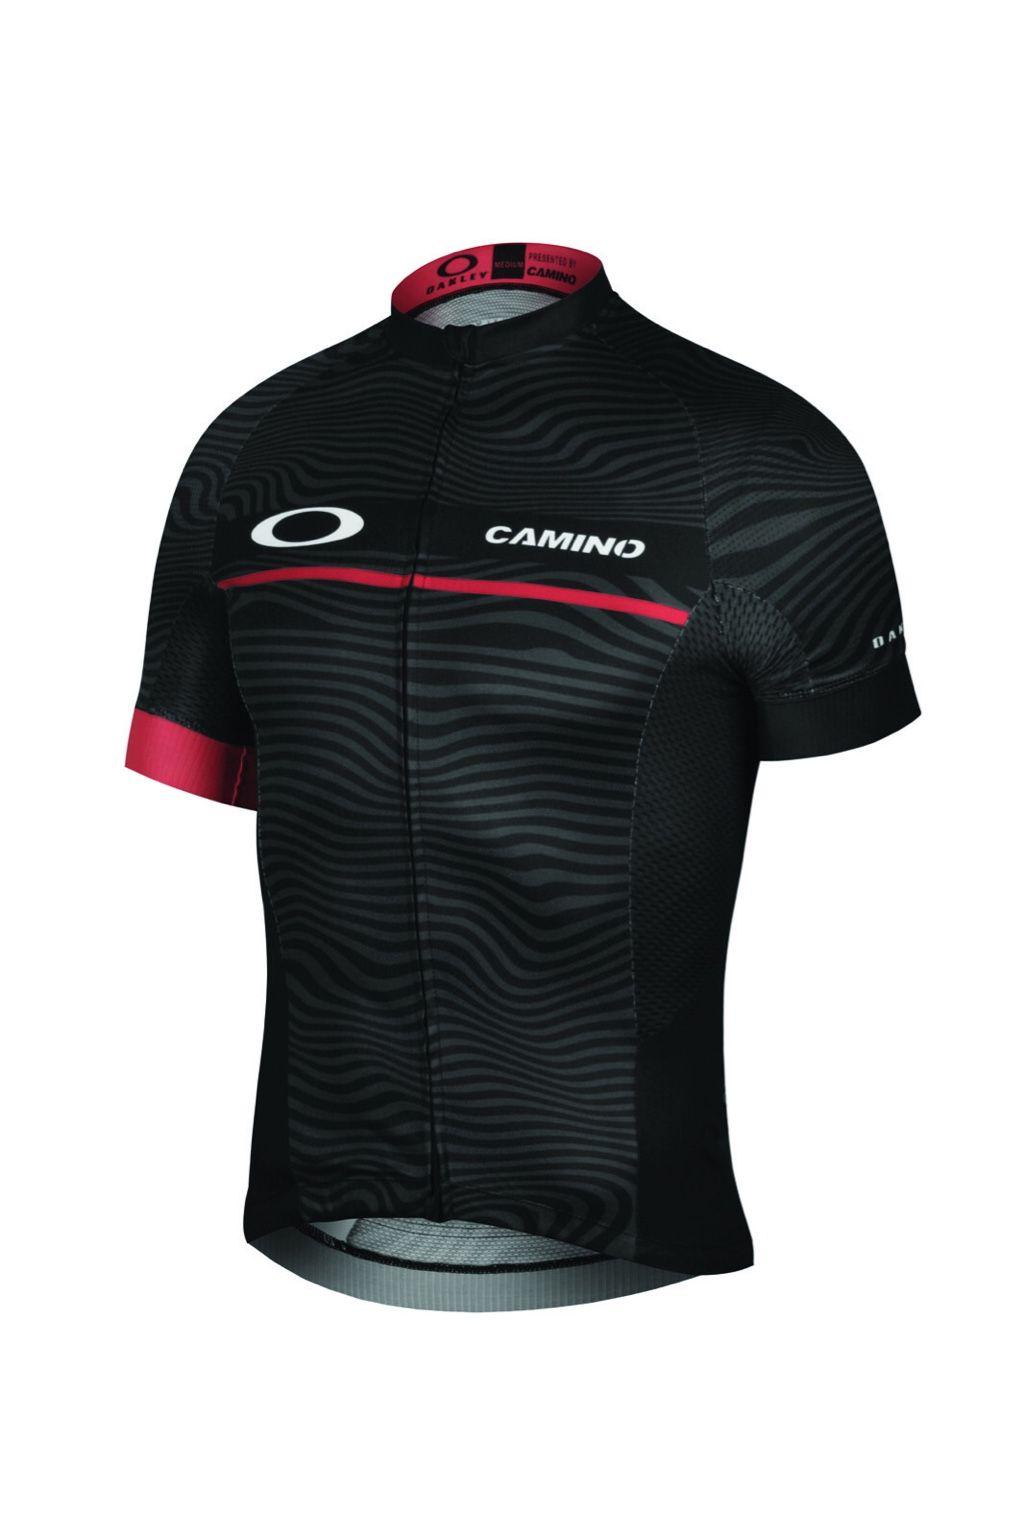 Oakley x Camino Cycling Kit - 621d36fc8faf6b42c0e268fcb6059c13.jpg